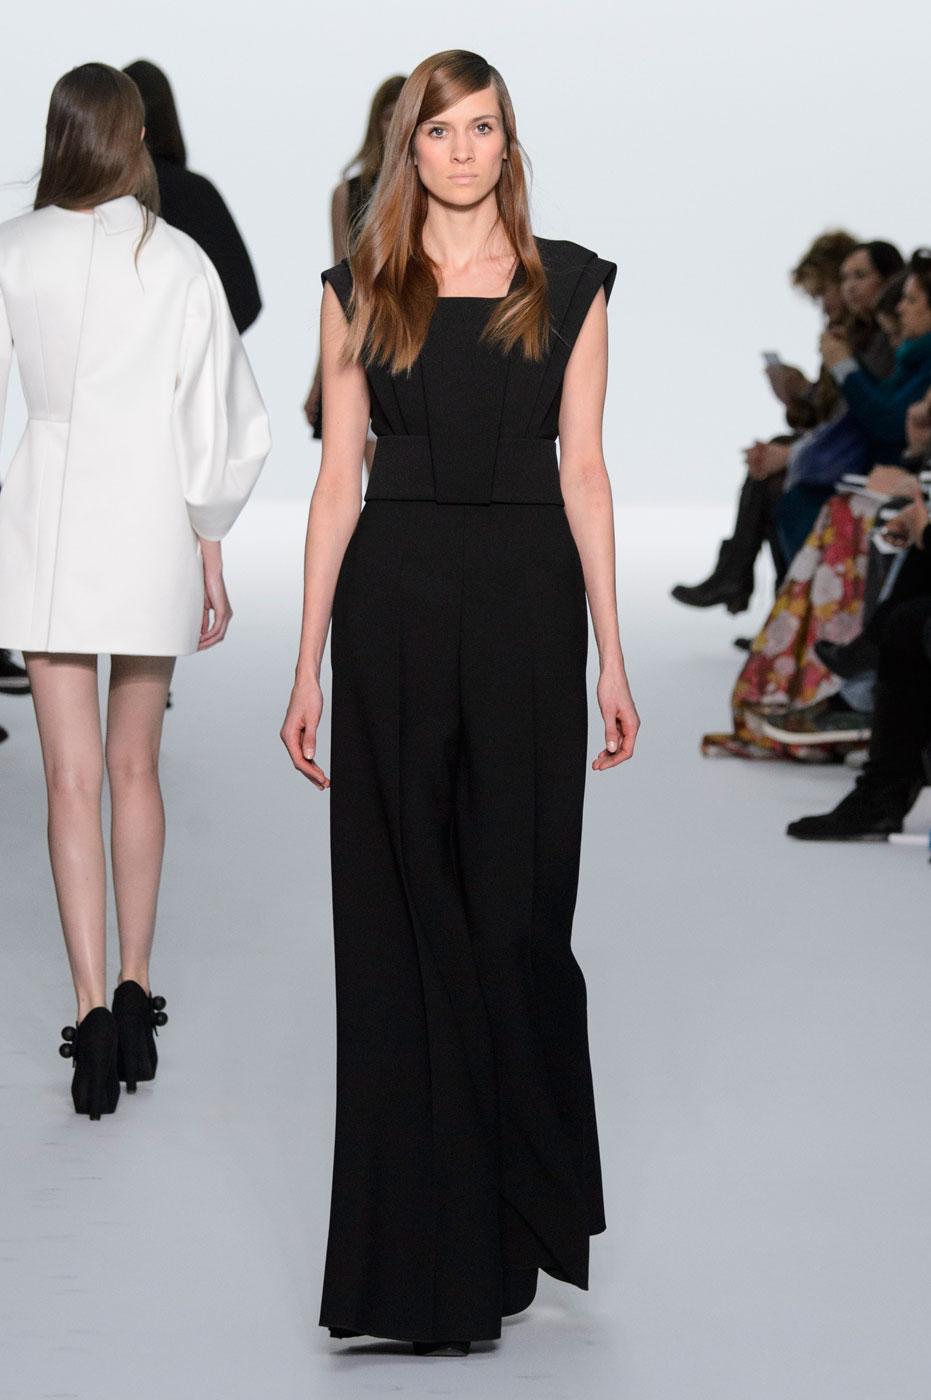 Kayek-fashion-runway-show-haute-couture-paris-spring-summer-2015-the-impression-13